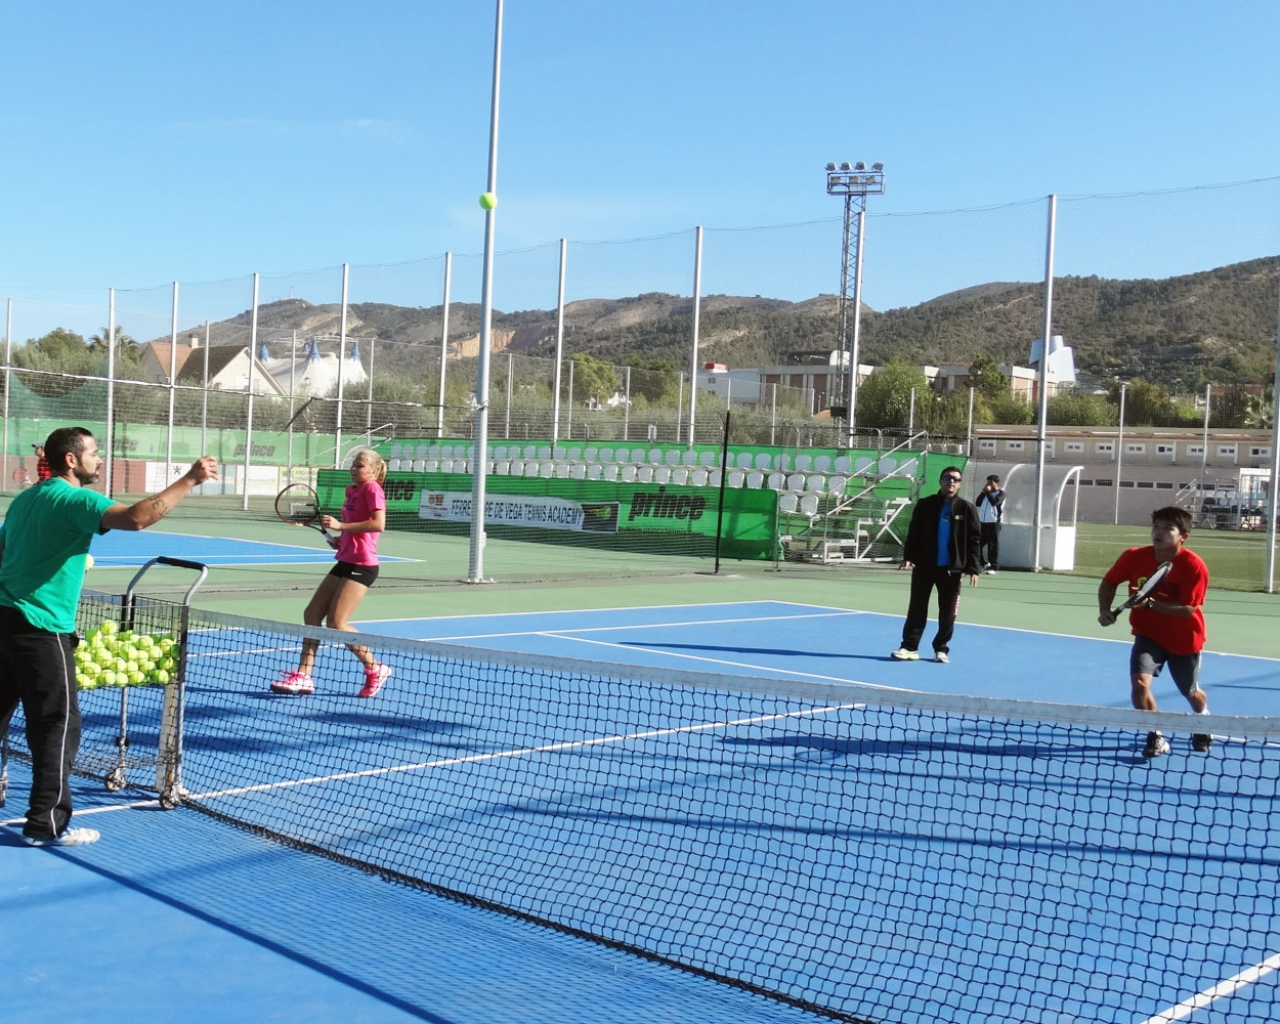 David Ferrer Tennis Camp In Benidorm Spain With Languages